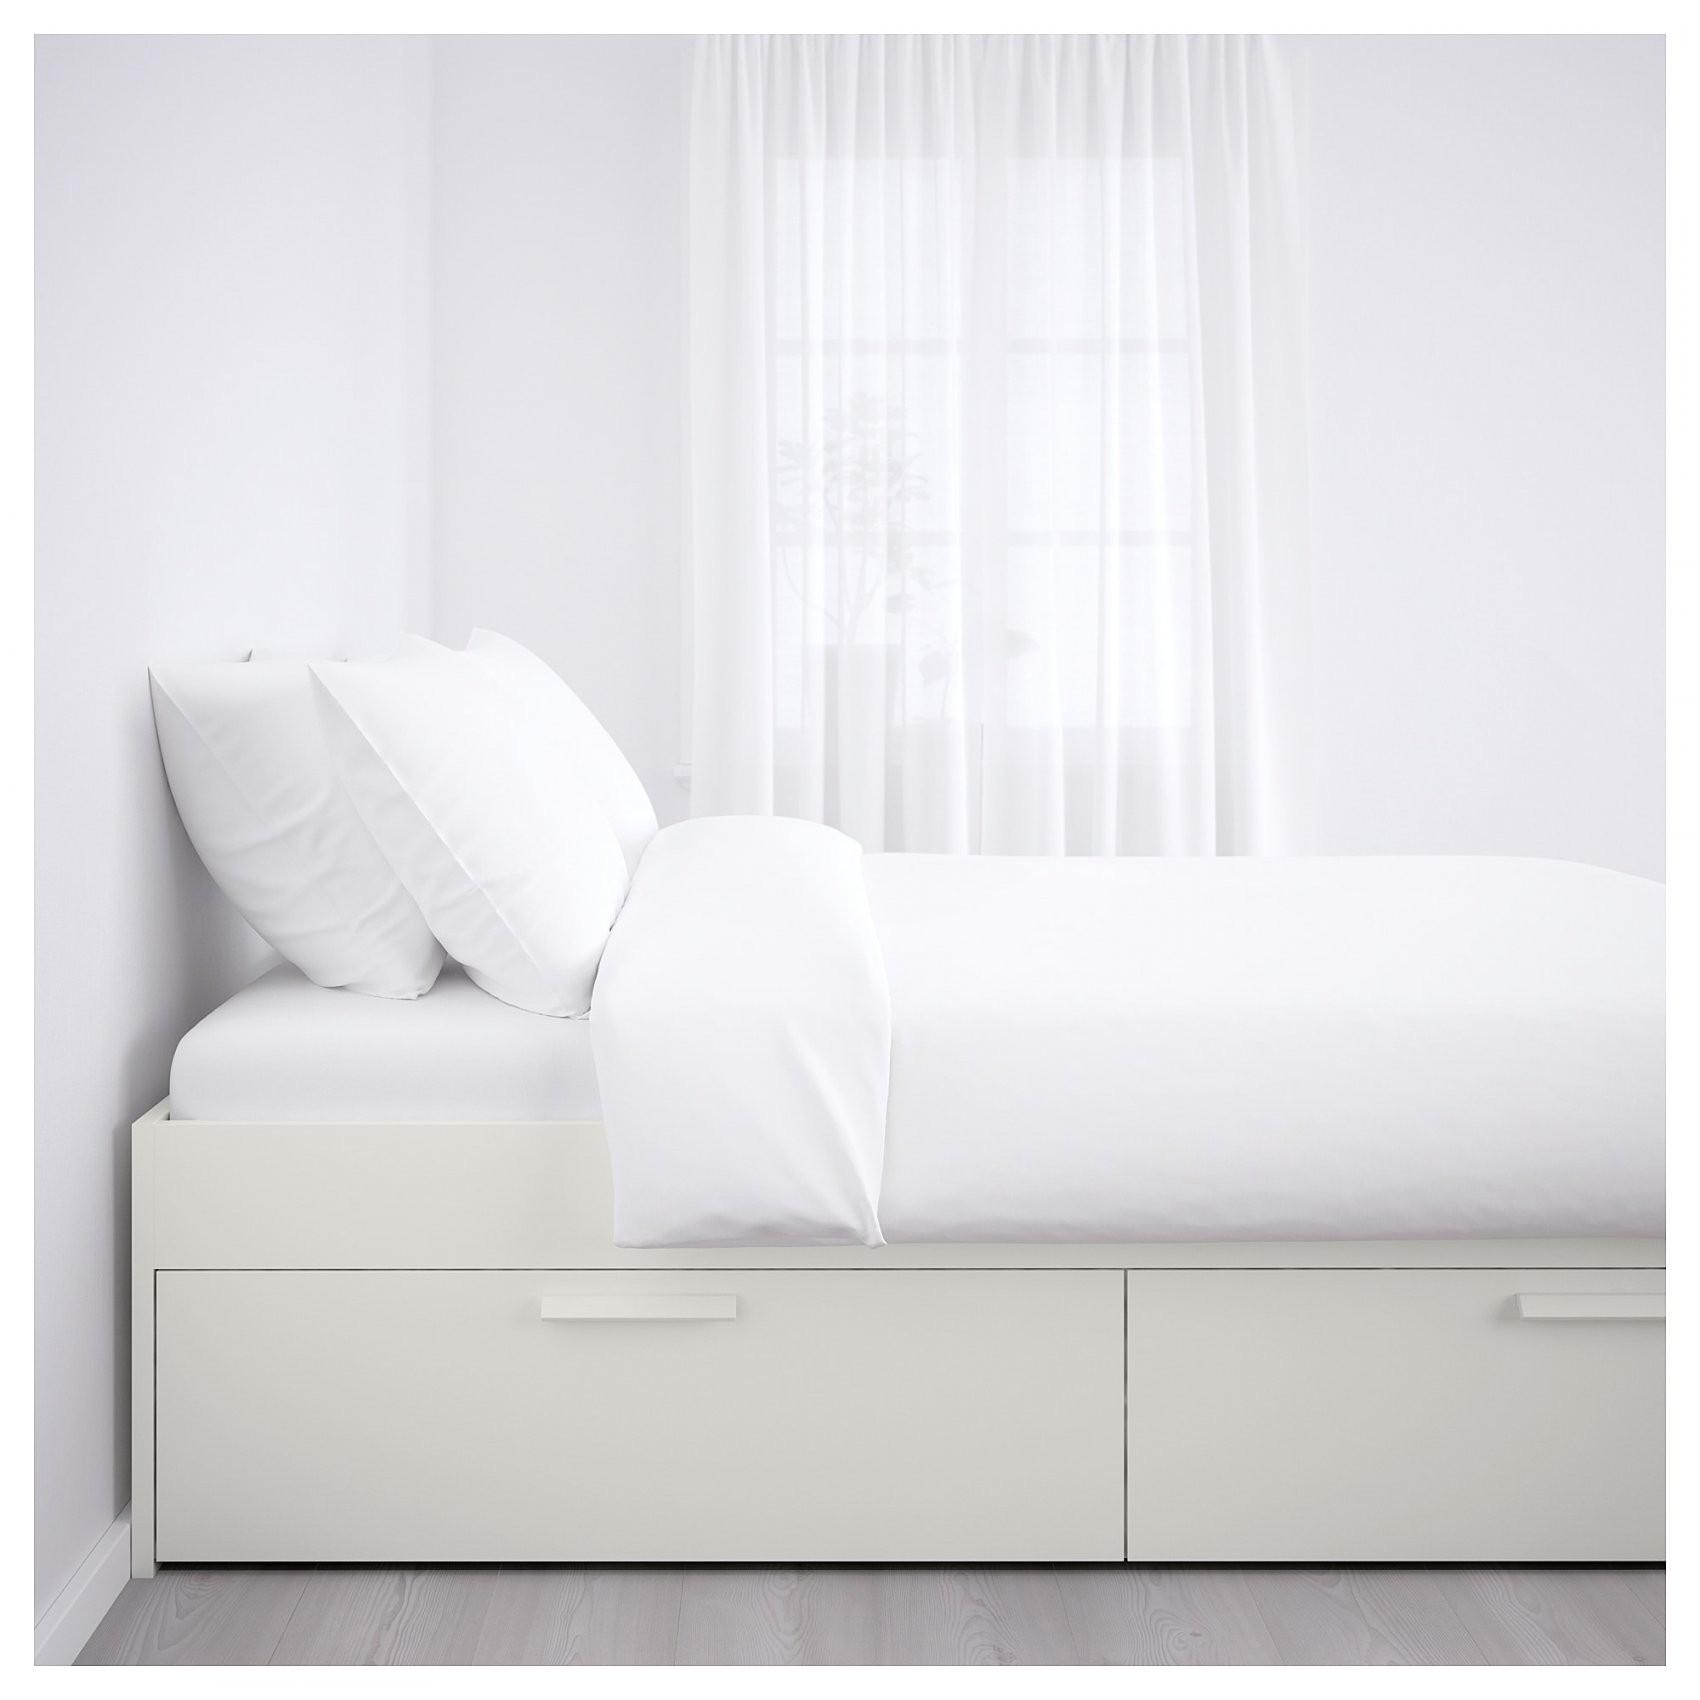 ikea brimnes bett 160x200 haus bauen. Black Bedroom Furniture Sets. Home Design Ideas